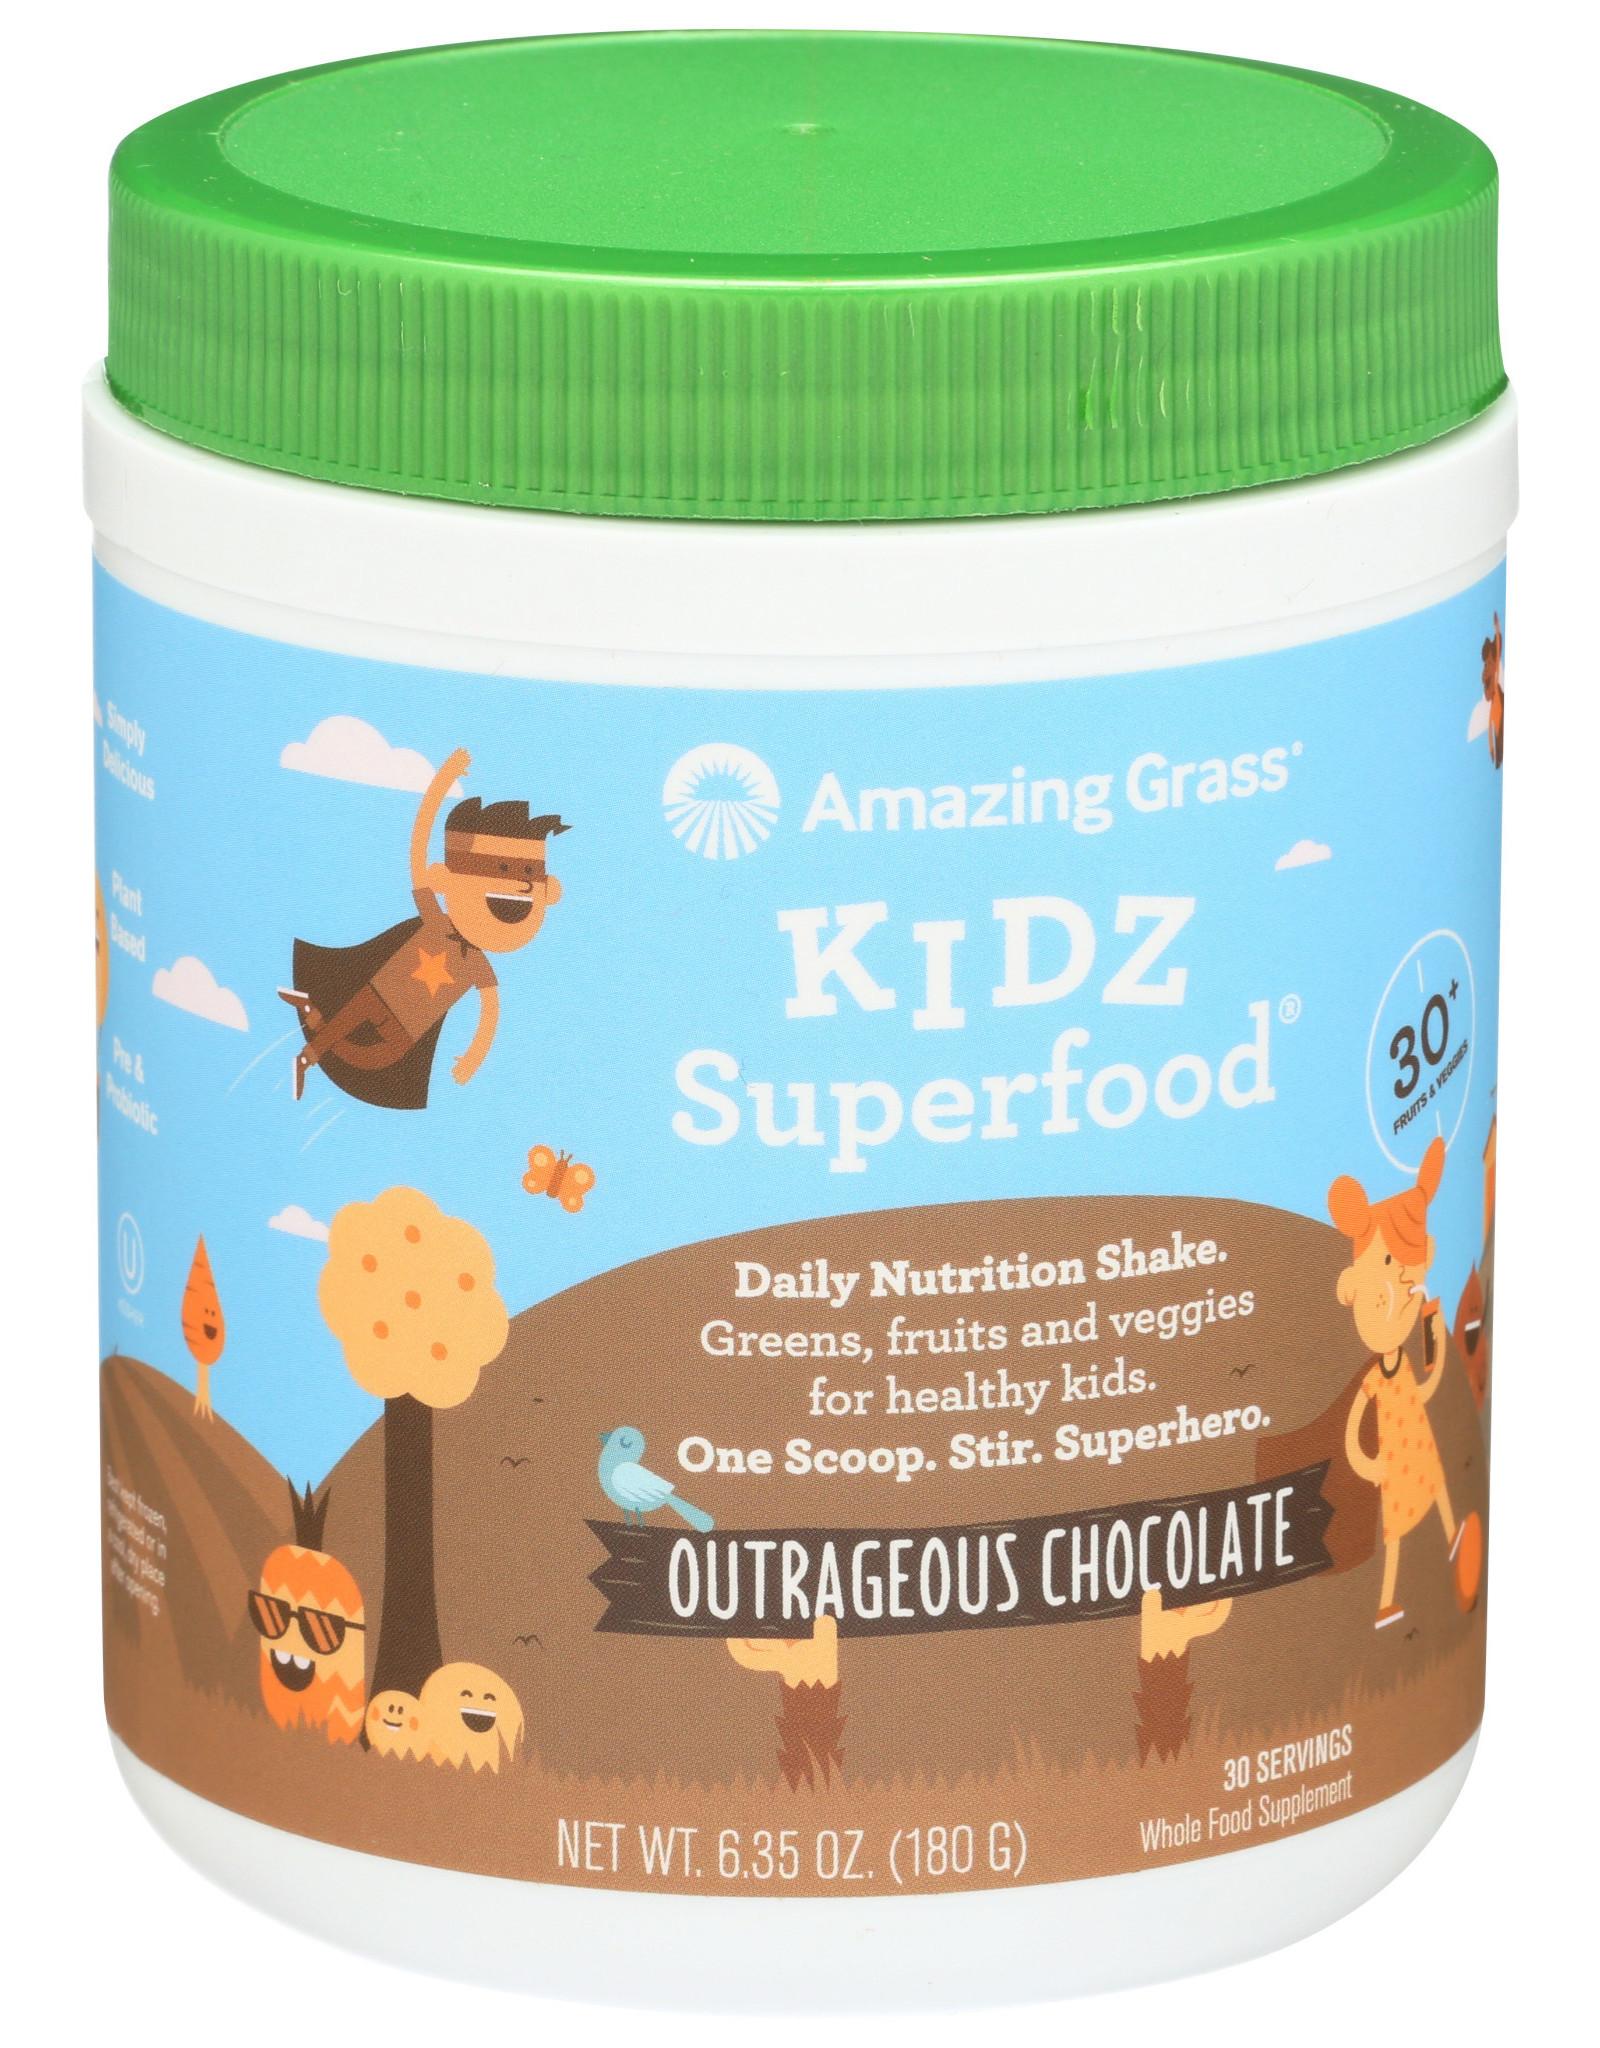 AMAZING GRASS KIDZ SUPERFOOD, OUTRAGEOUS CHOCOLATE, 6.35 OZ.